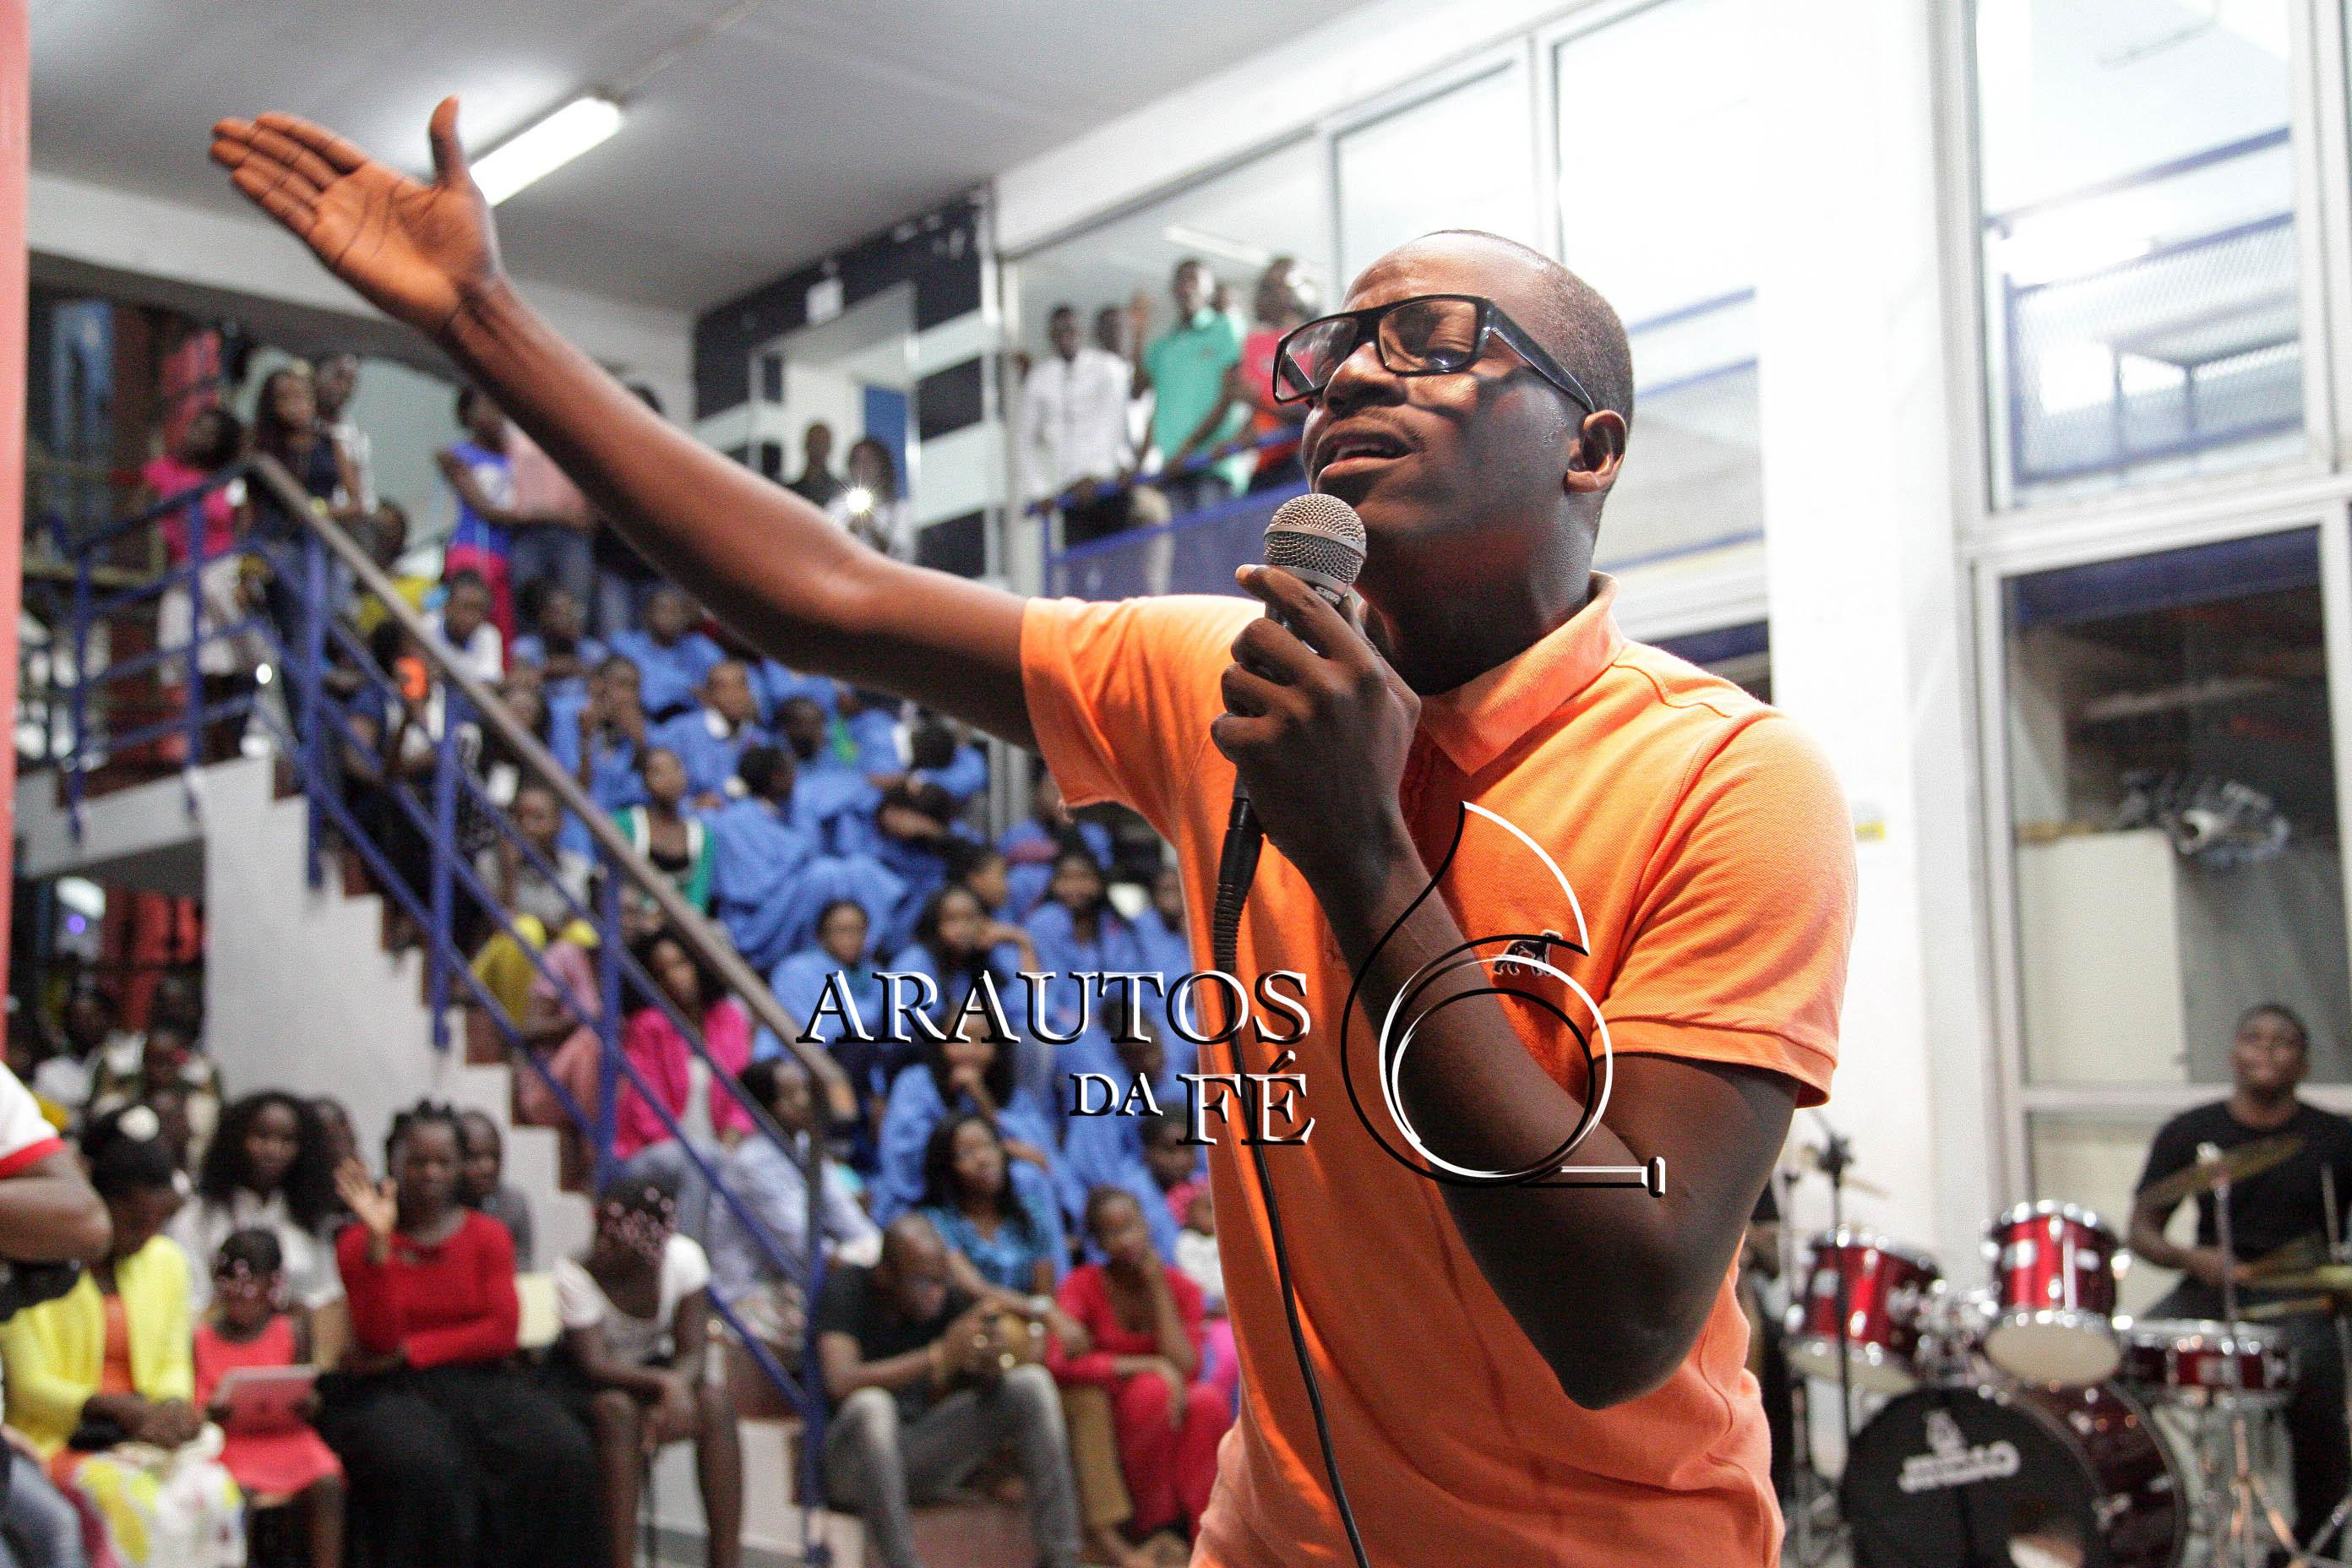 Victor Antonio realiza show